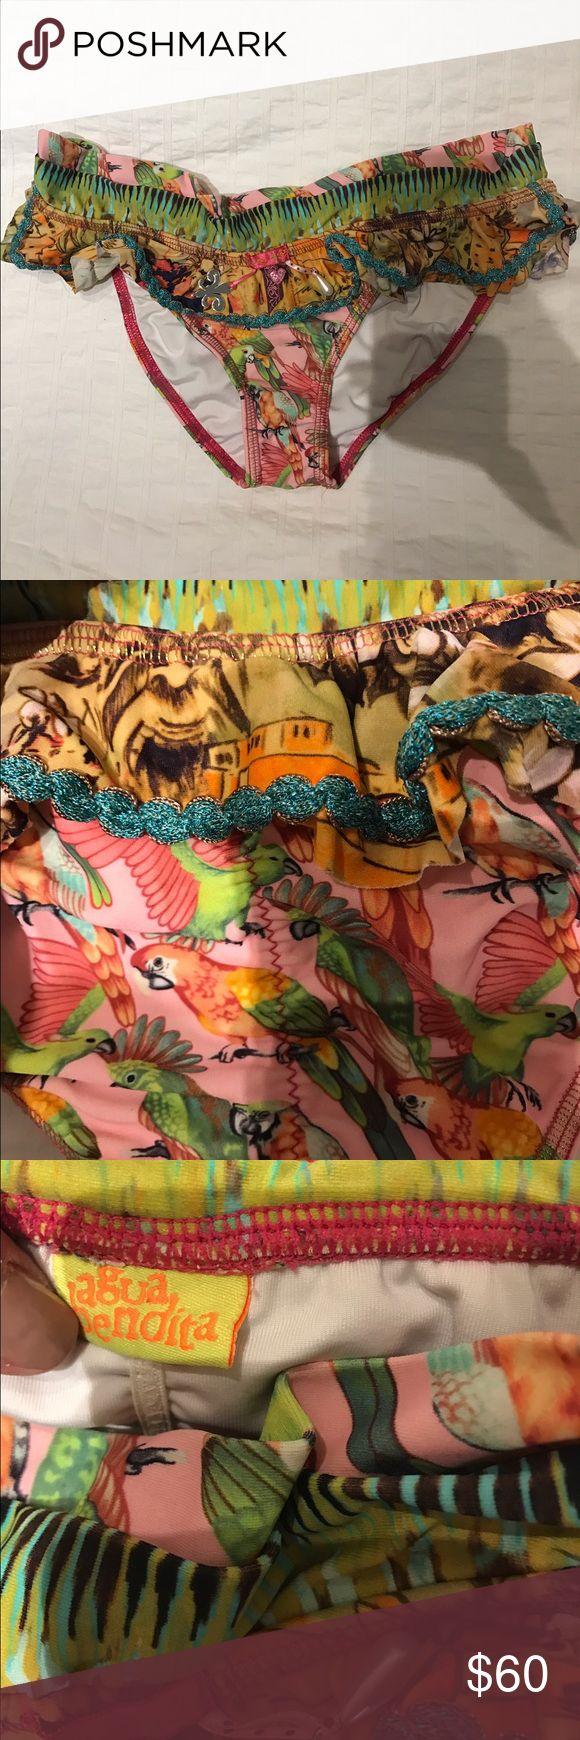 Shia Bendita bikini bottoms. Only worn a couple times. Size small. Brazilian cut back. agua bendita Swim Bikinis